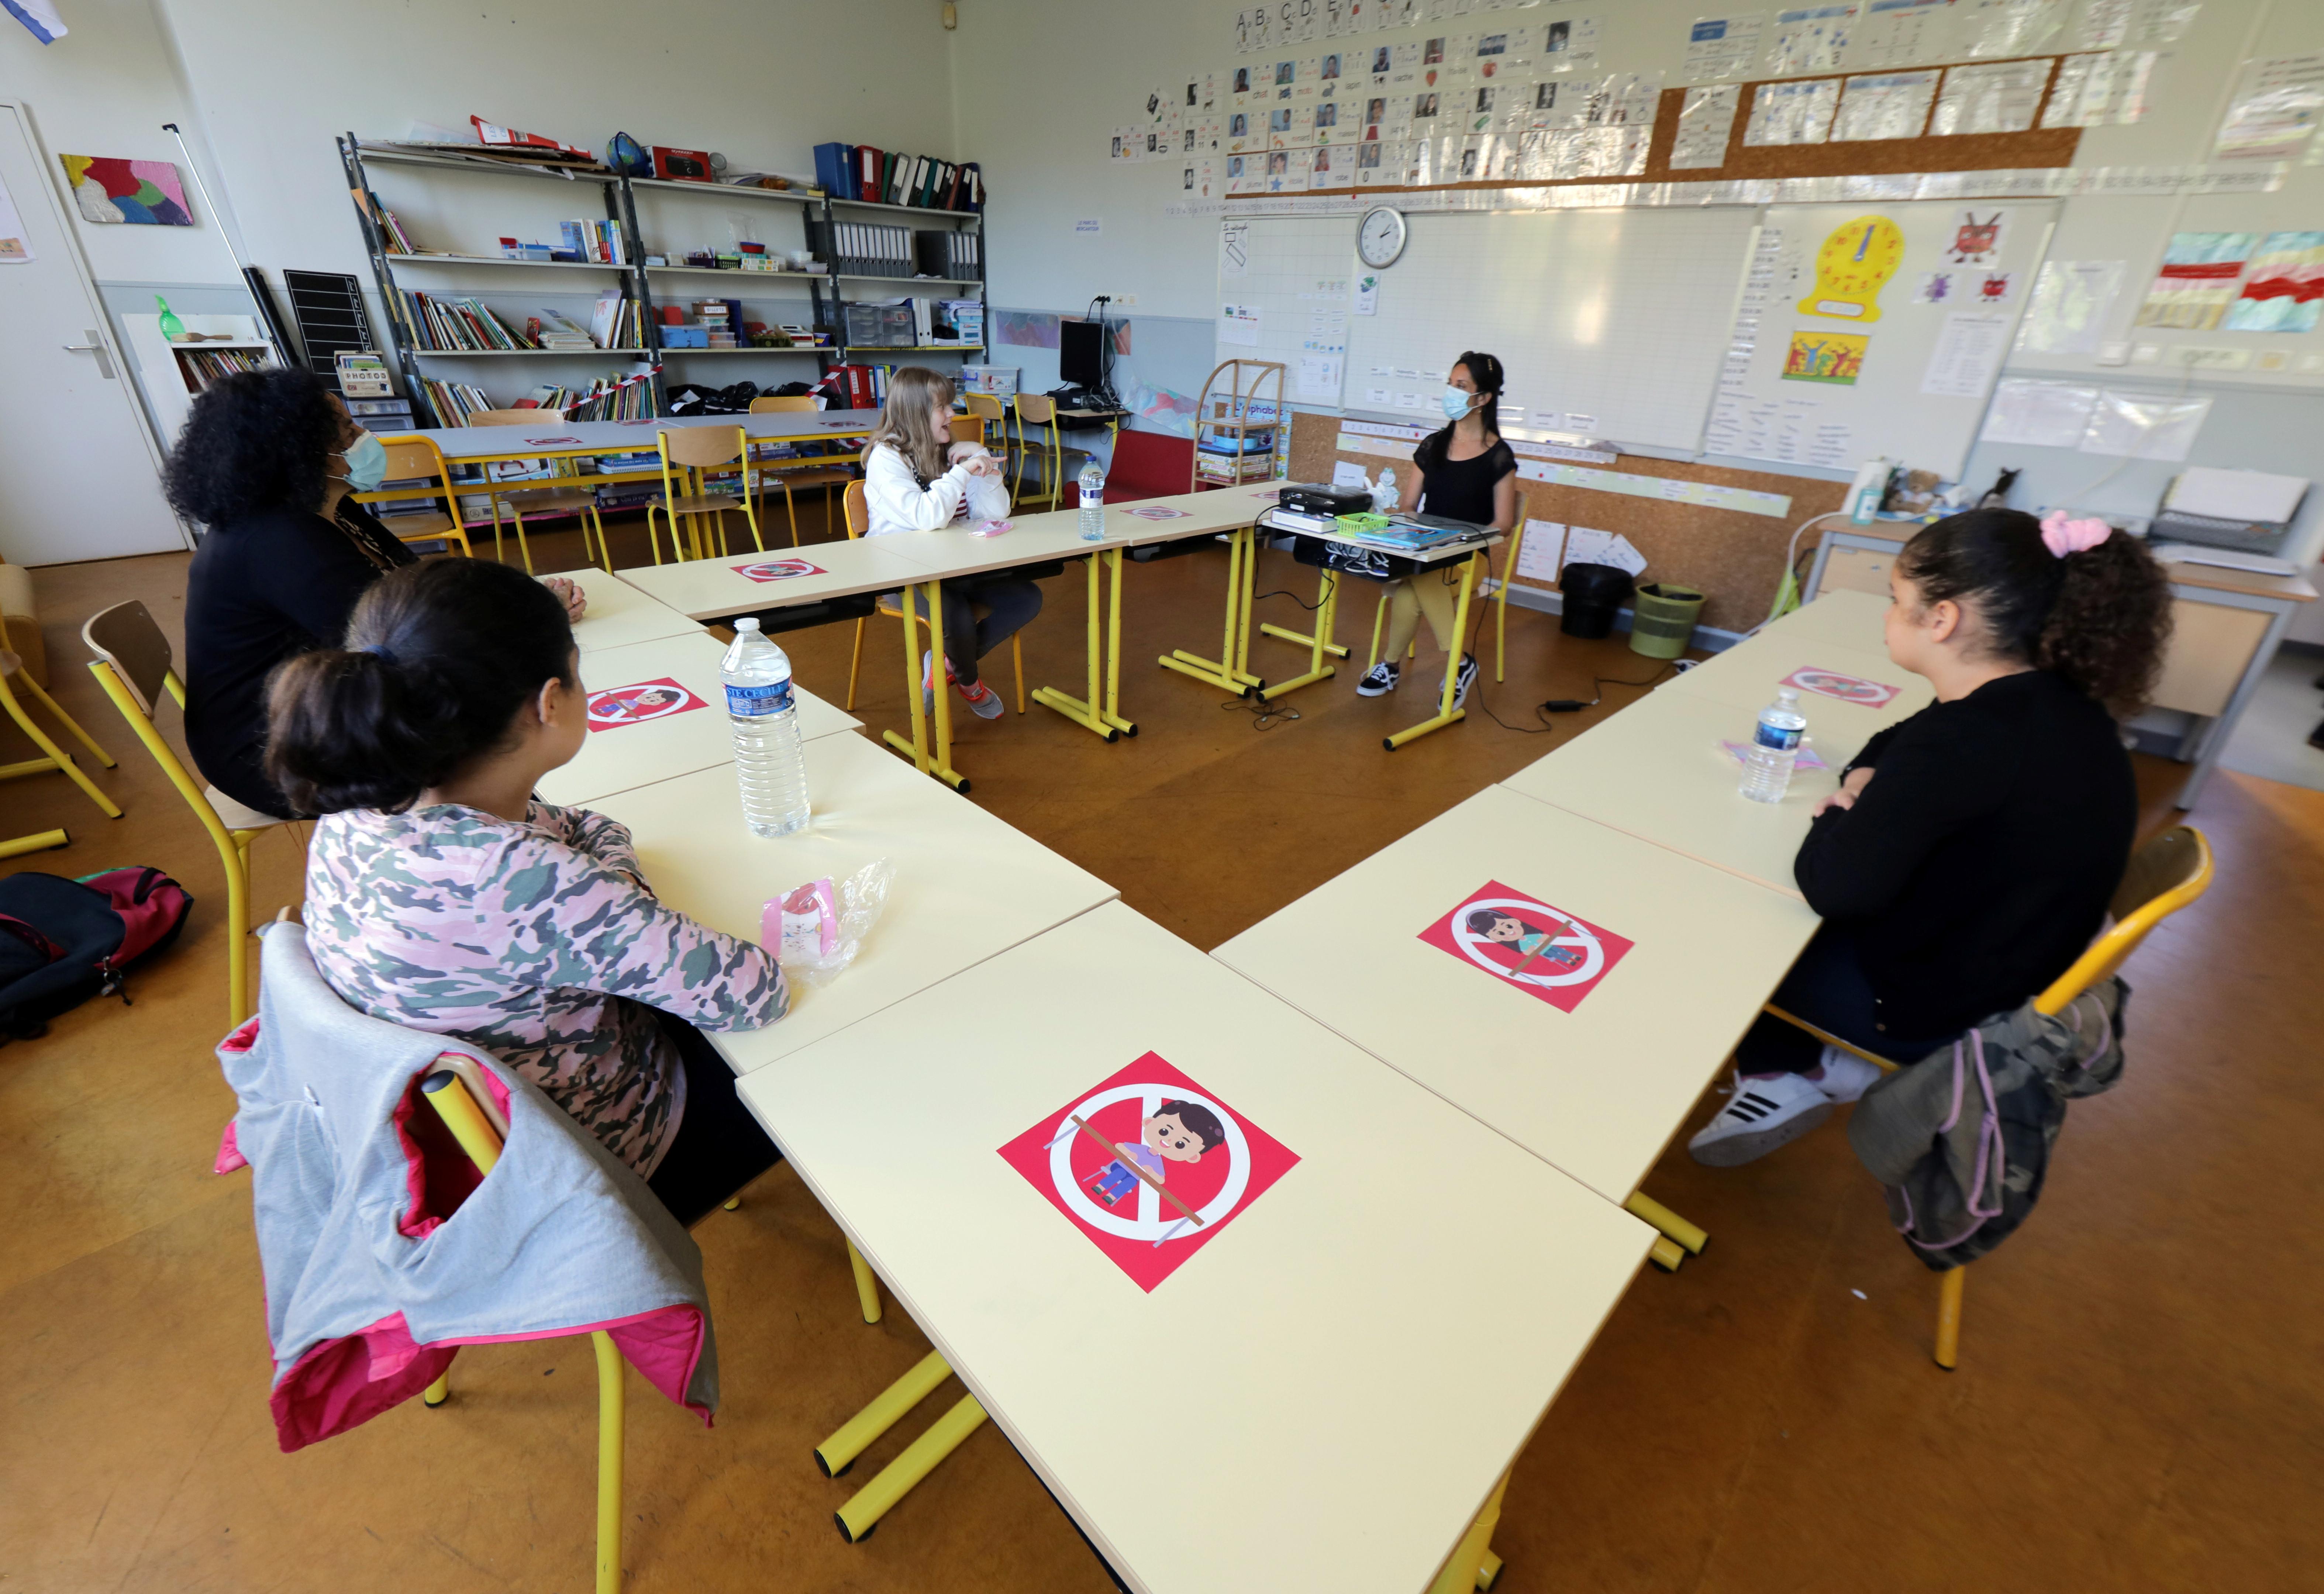 How Are Schools Reopening After The Coronavirus Lockdowns World Economic Forum